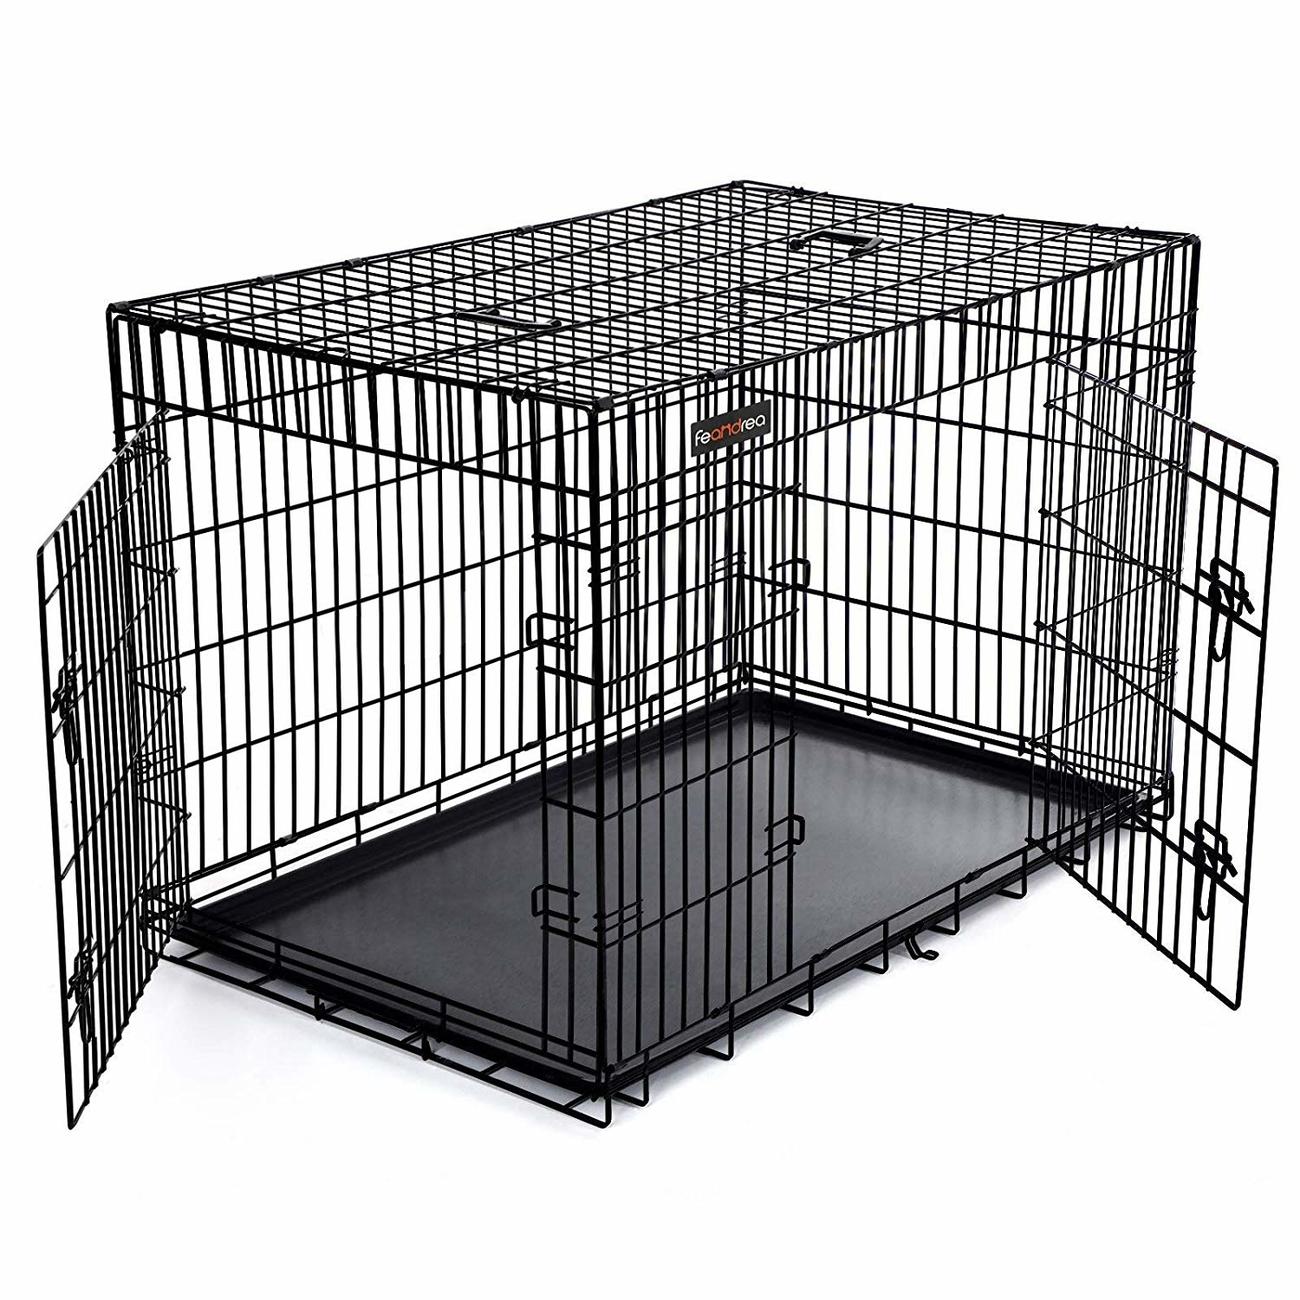 FEANDREA by SONGMICS Hundekäfig 2 Türen zusammenklappbar Bild 19